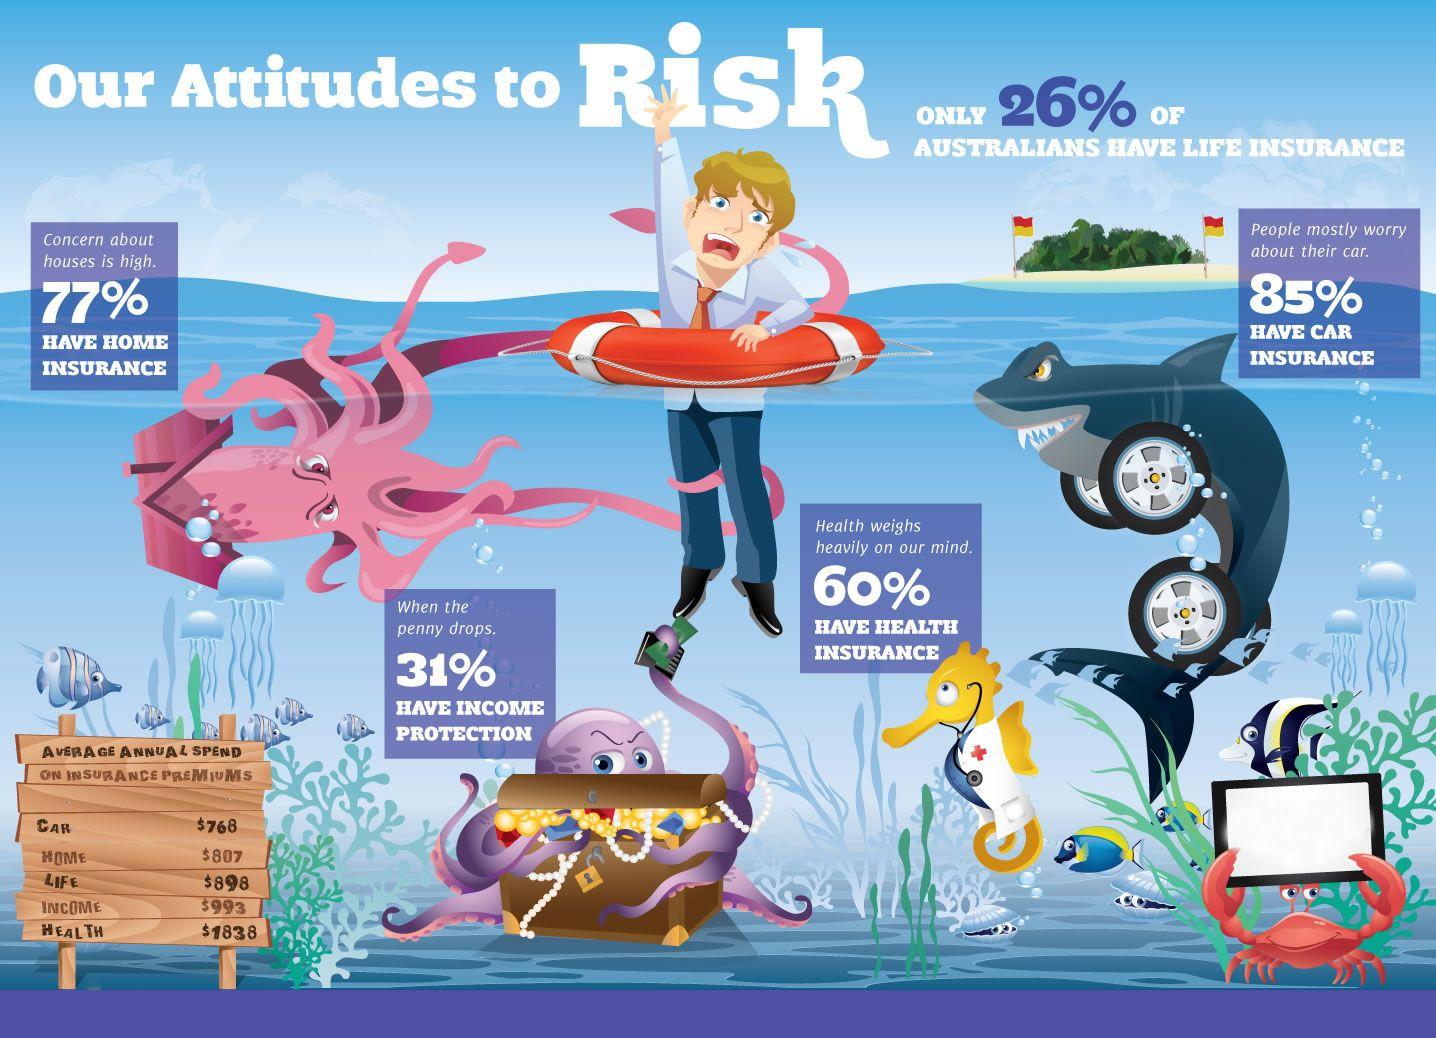 HomeOwnersInsuranceFortLauderdale Risks Insurance